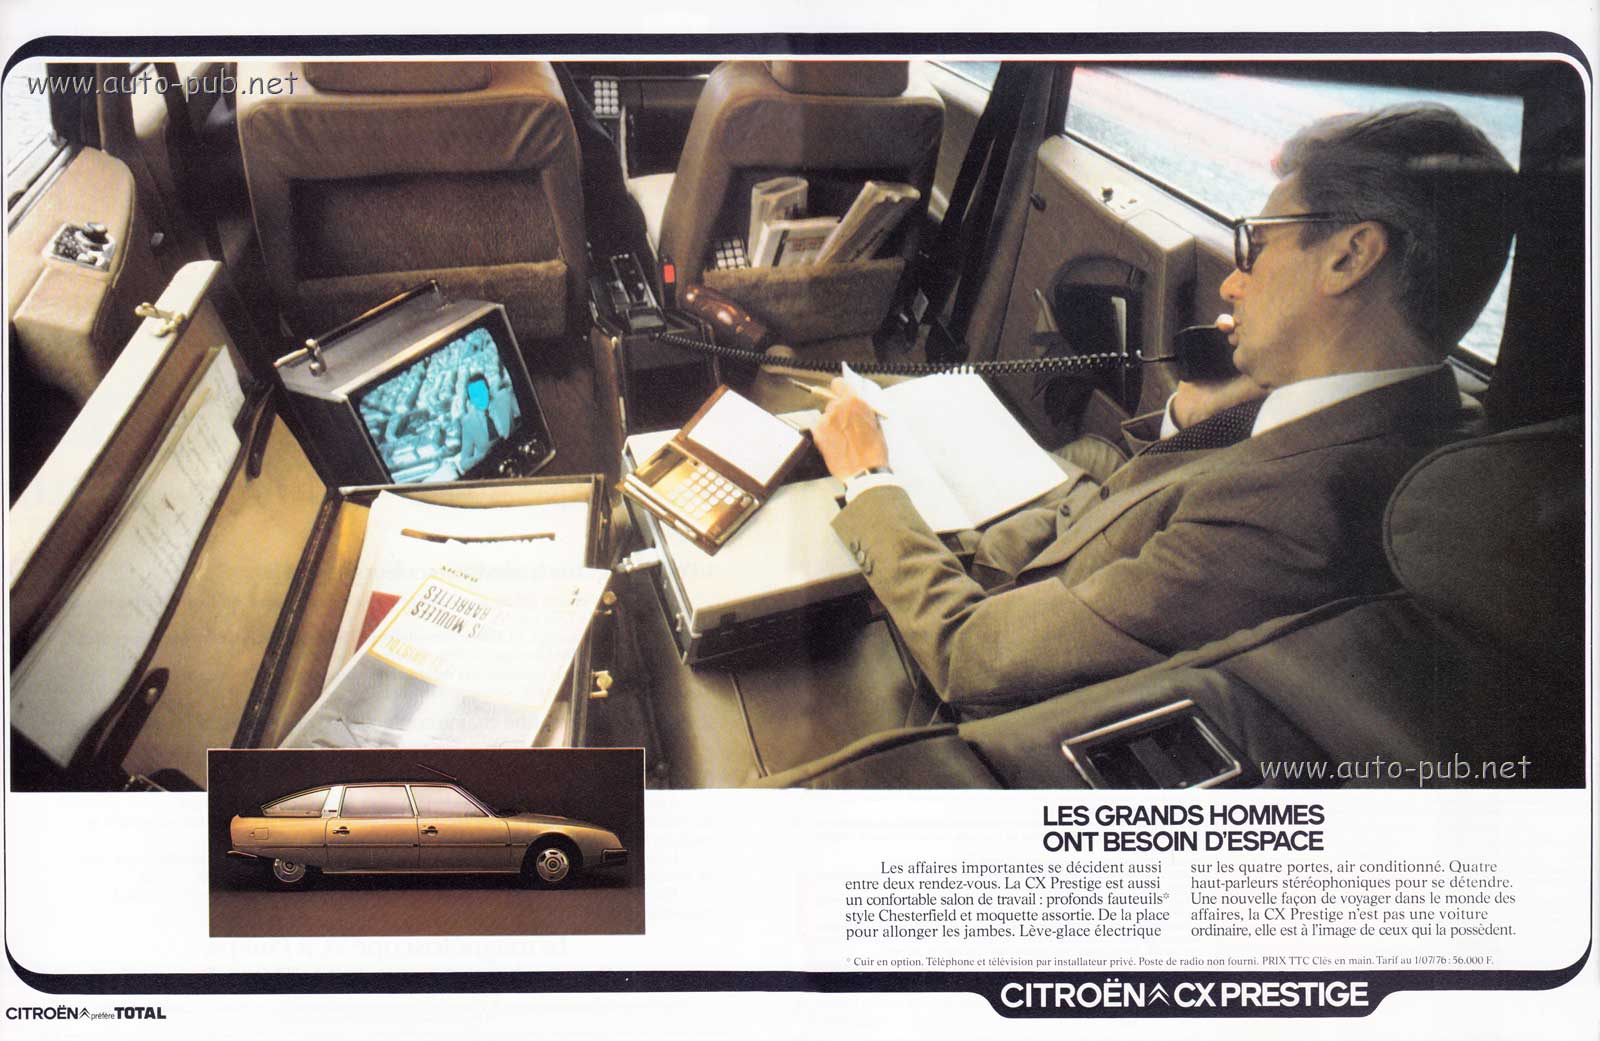 CX-Prestige-grands-hommes.jpg